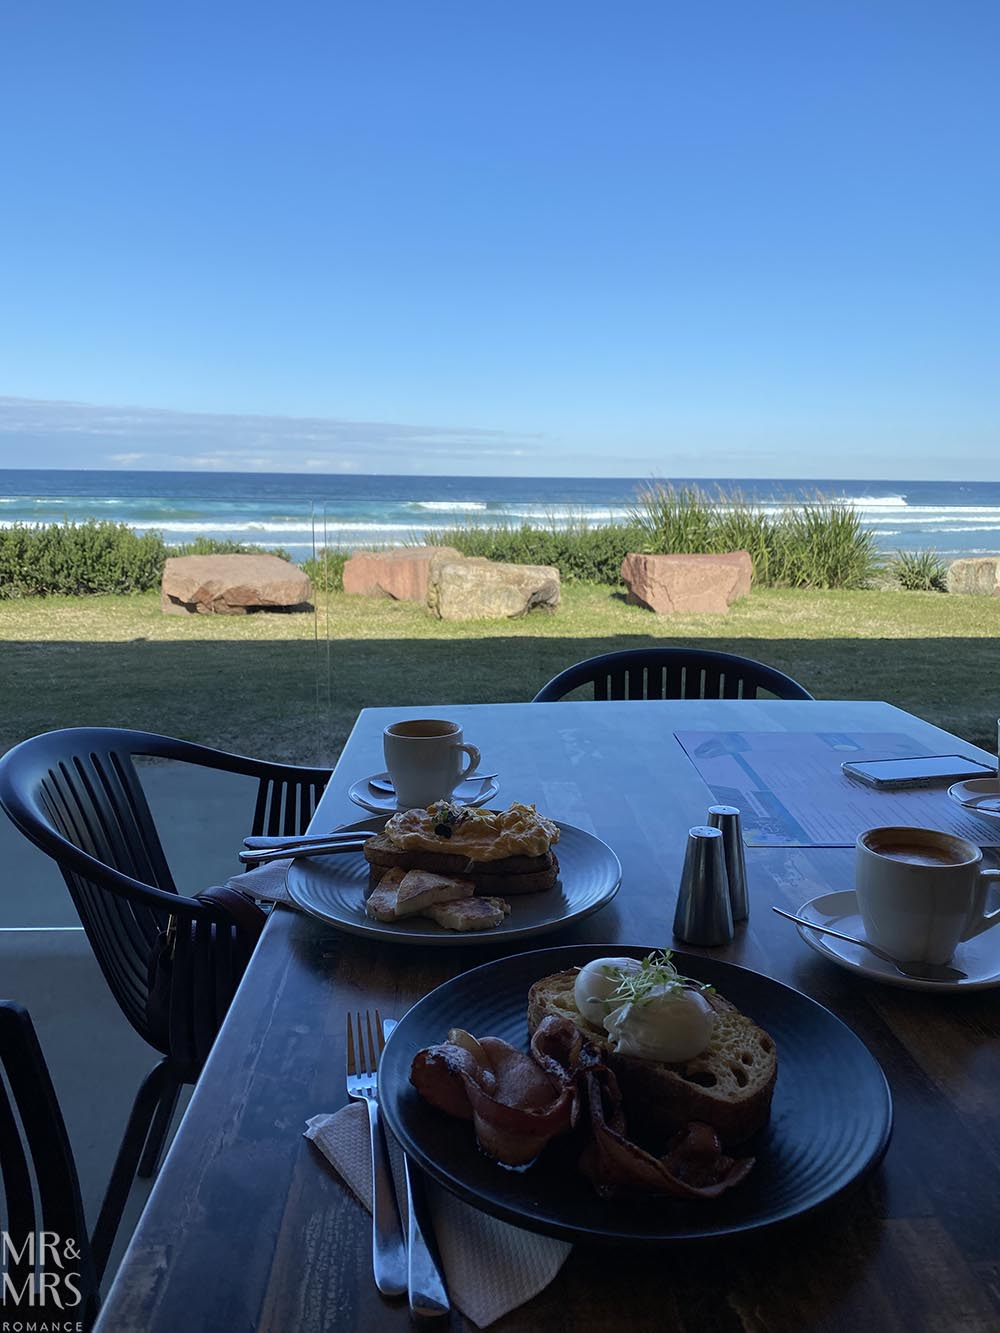 Crest Cafe Birubi Beach Anna Bay, Port Stephens NSW